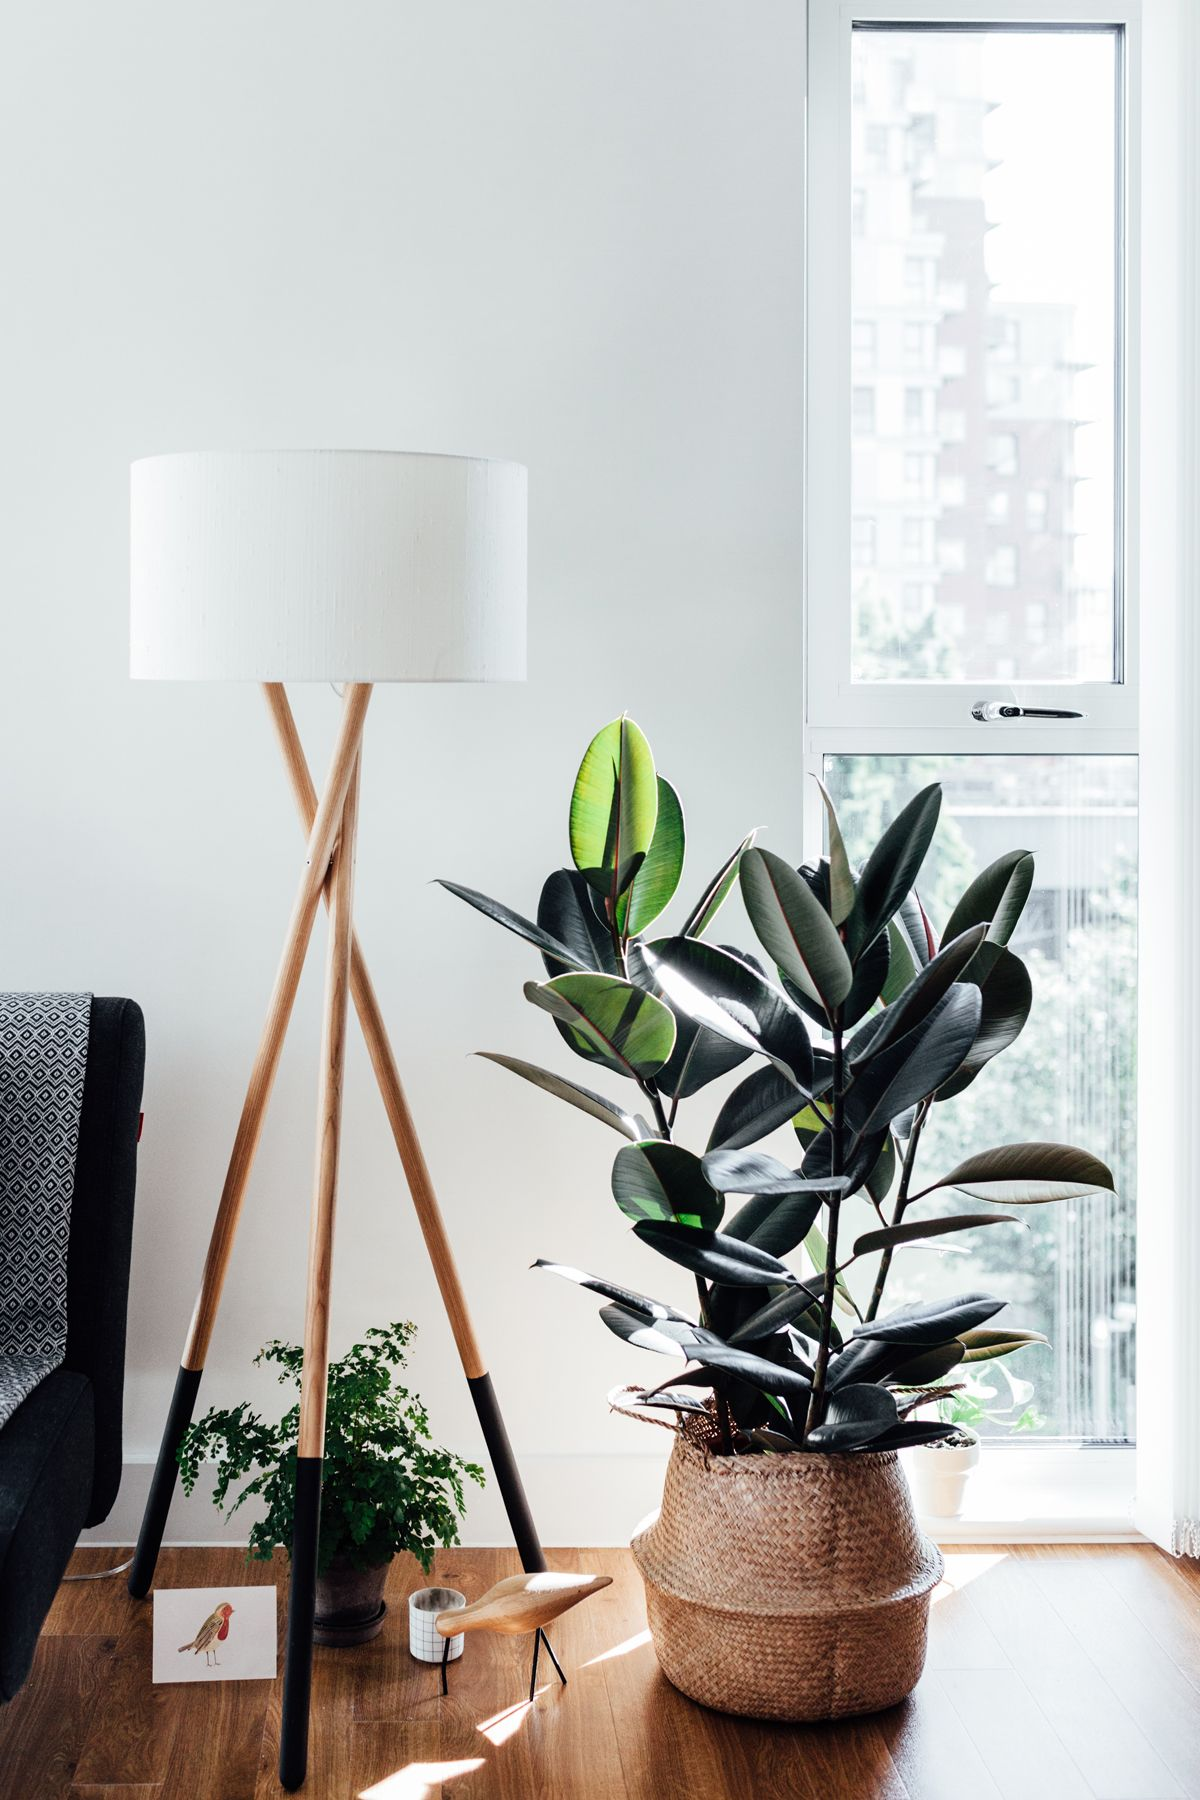 A corner of a stylish living room